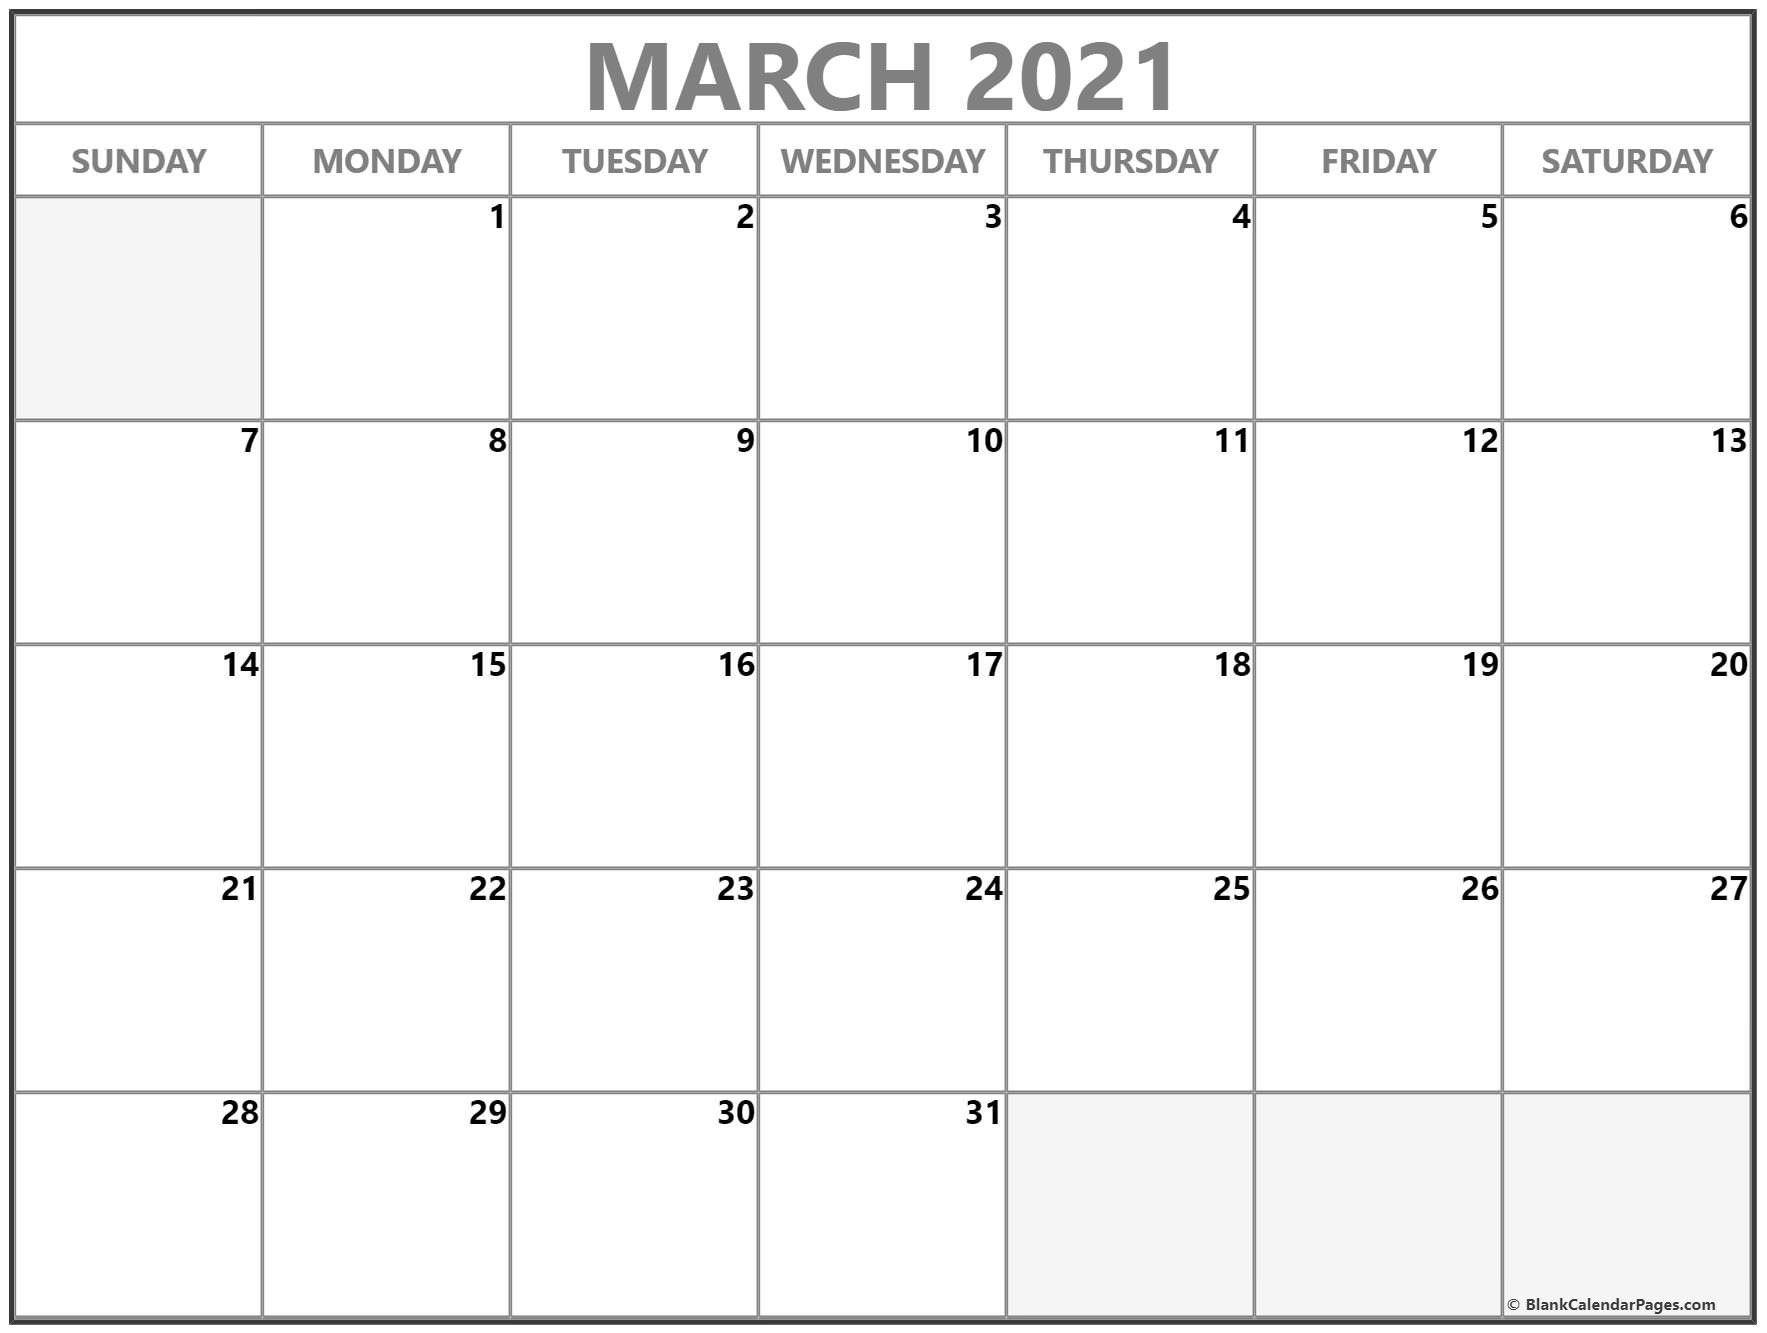 September 2021 Calendar - Free Download Printable Calendar